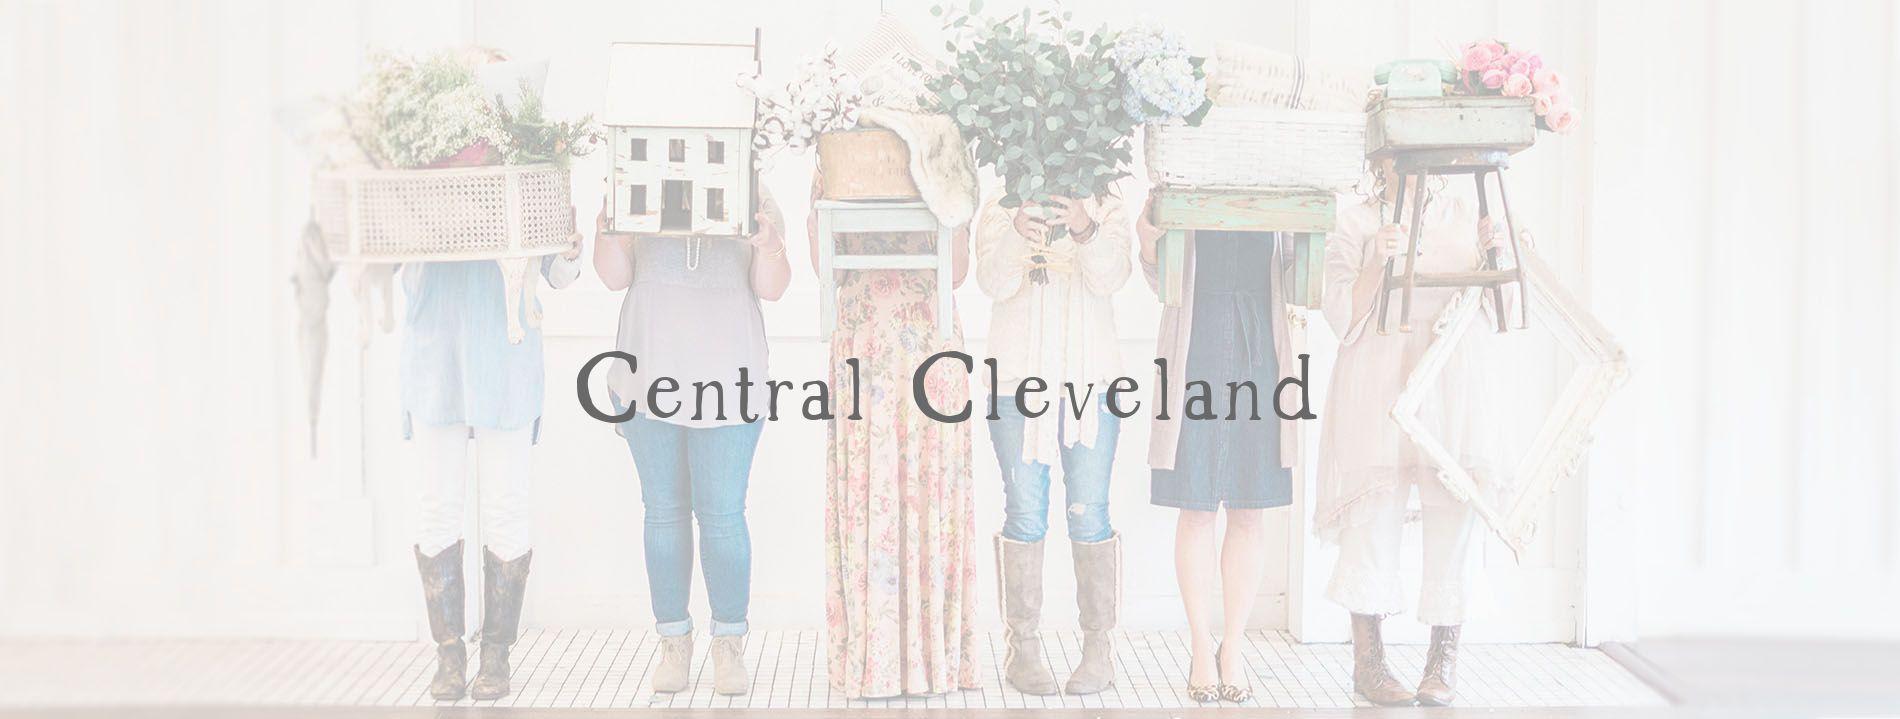 Central Cleveland